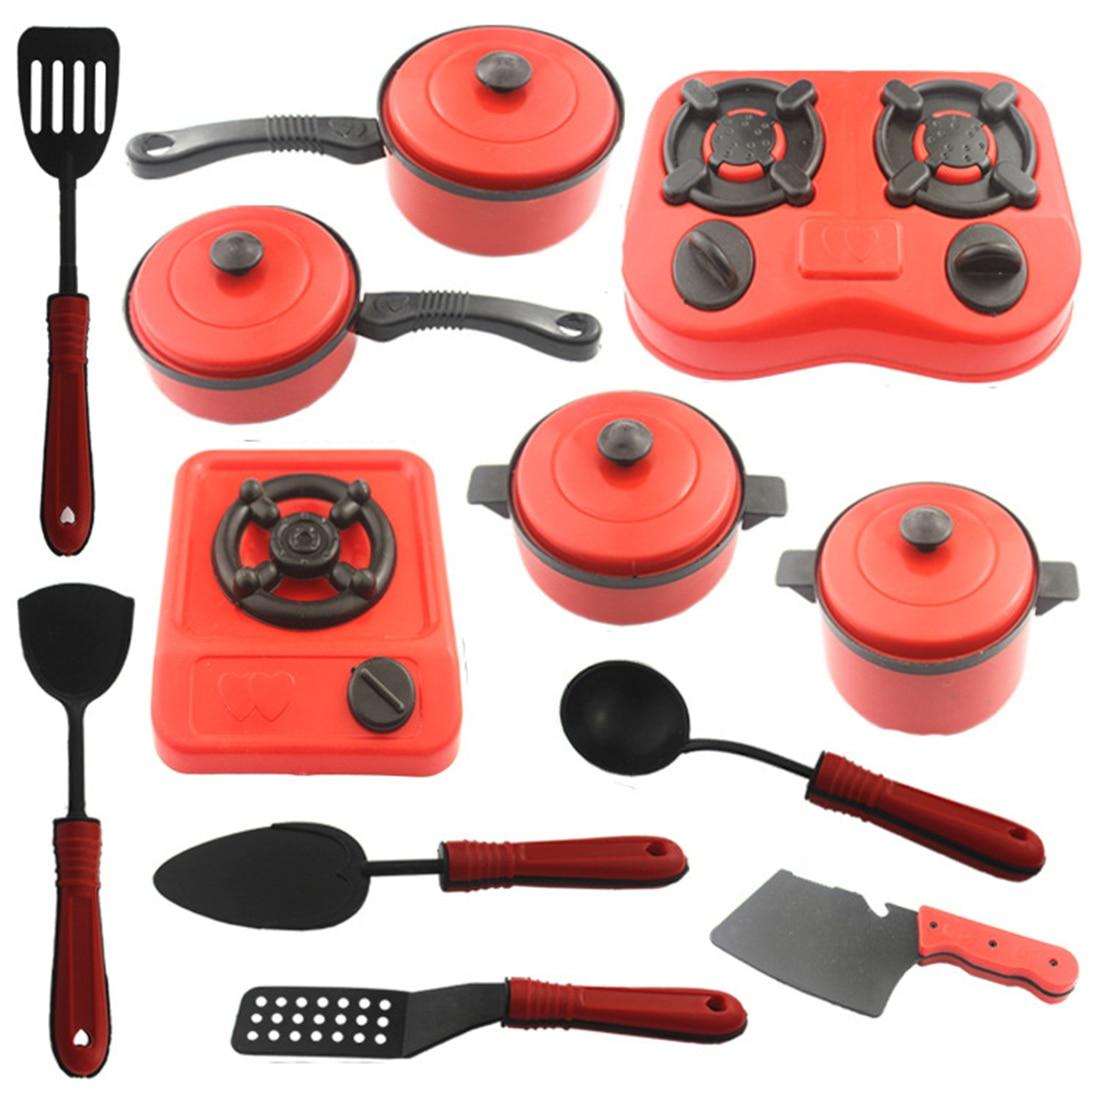 Surwish 12Pcs Kids House Kitchen Toy Cooking Cookware Children ...